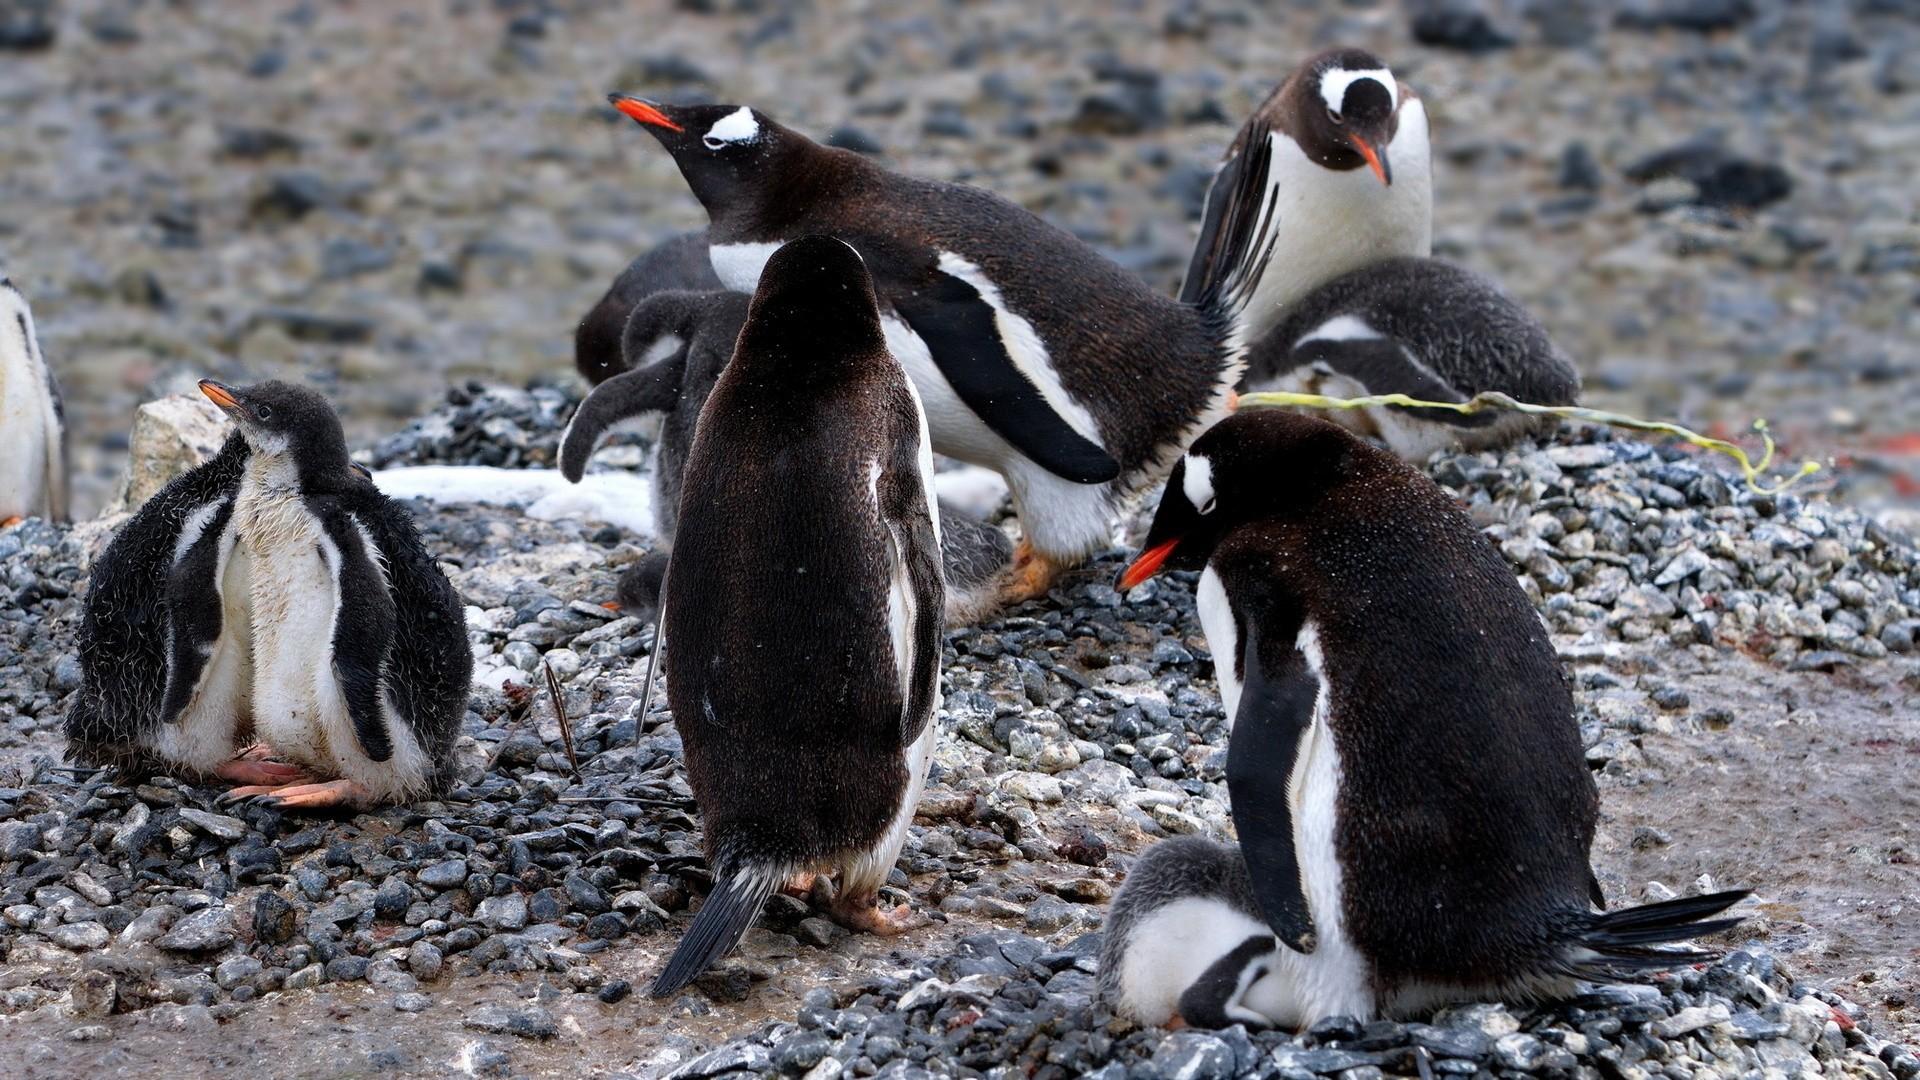 General 1920x1080 animals penguins birds baby animals